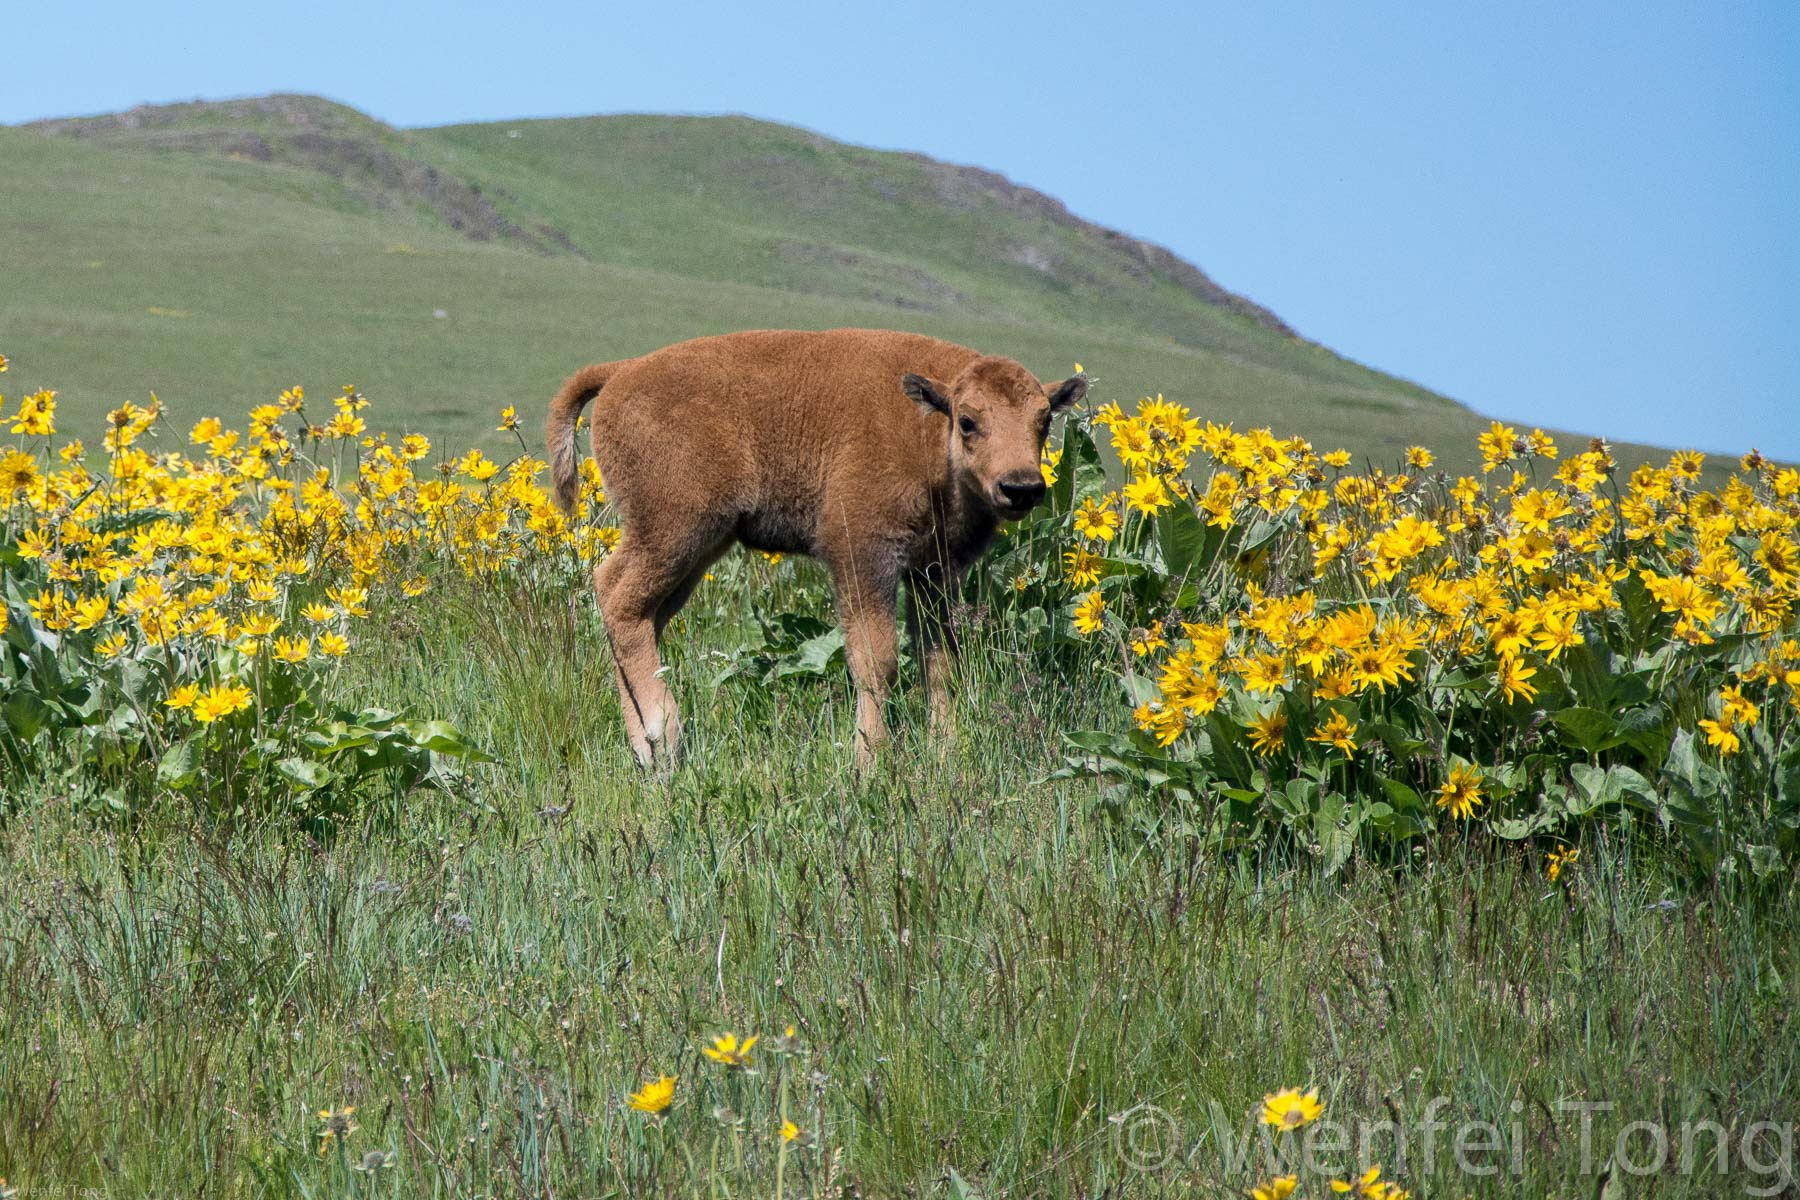 Bison calf among the arrowleaf balsamroot